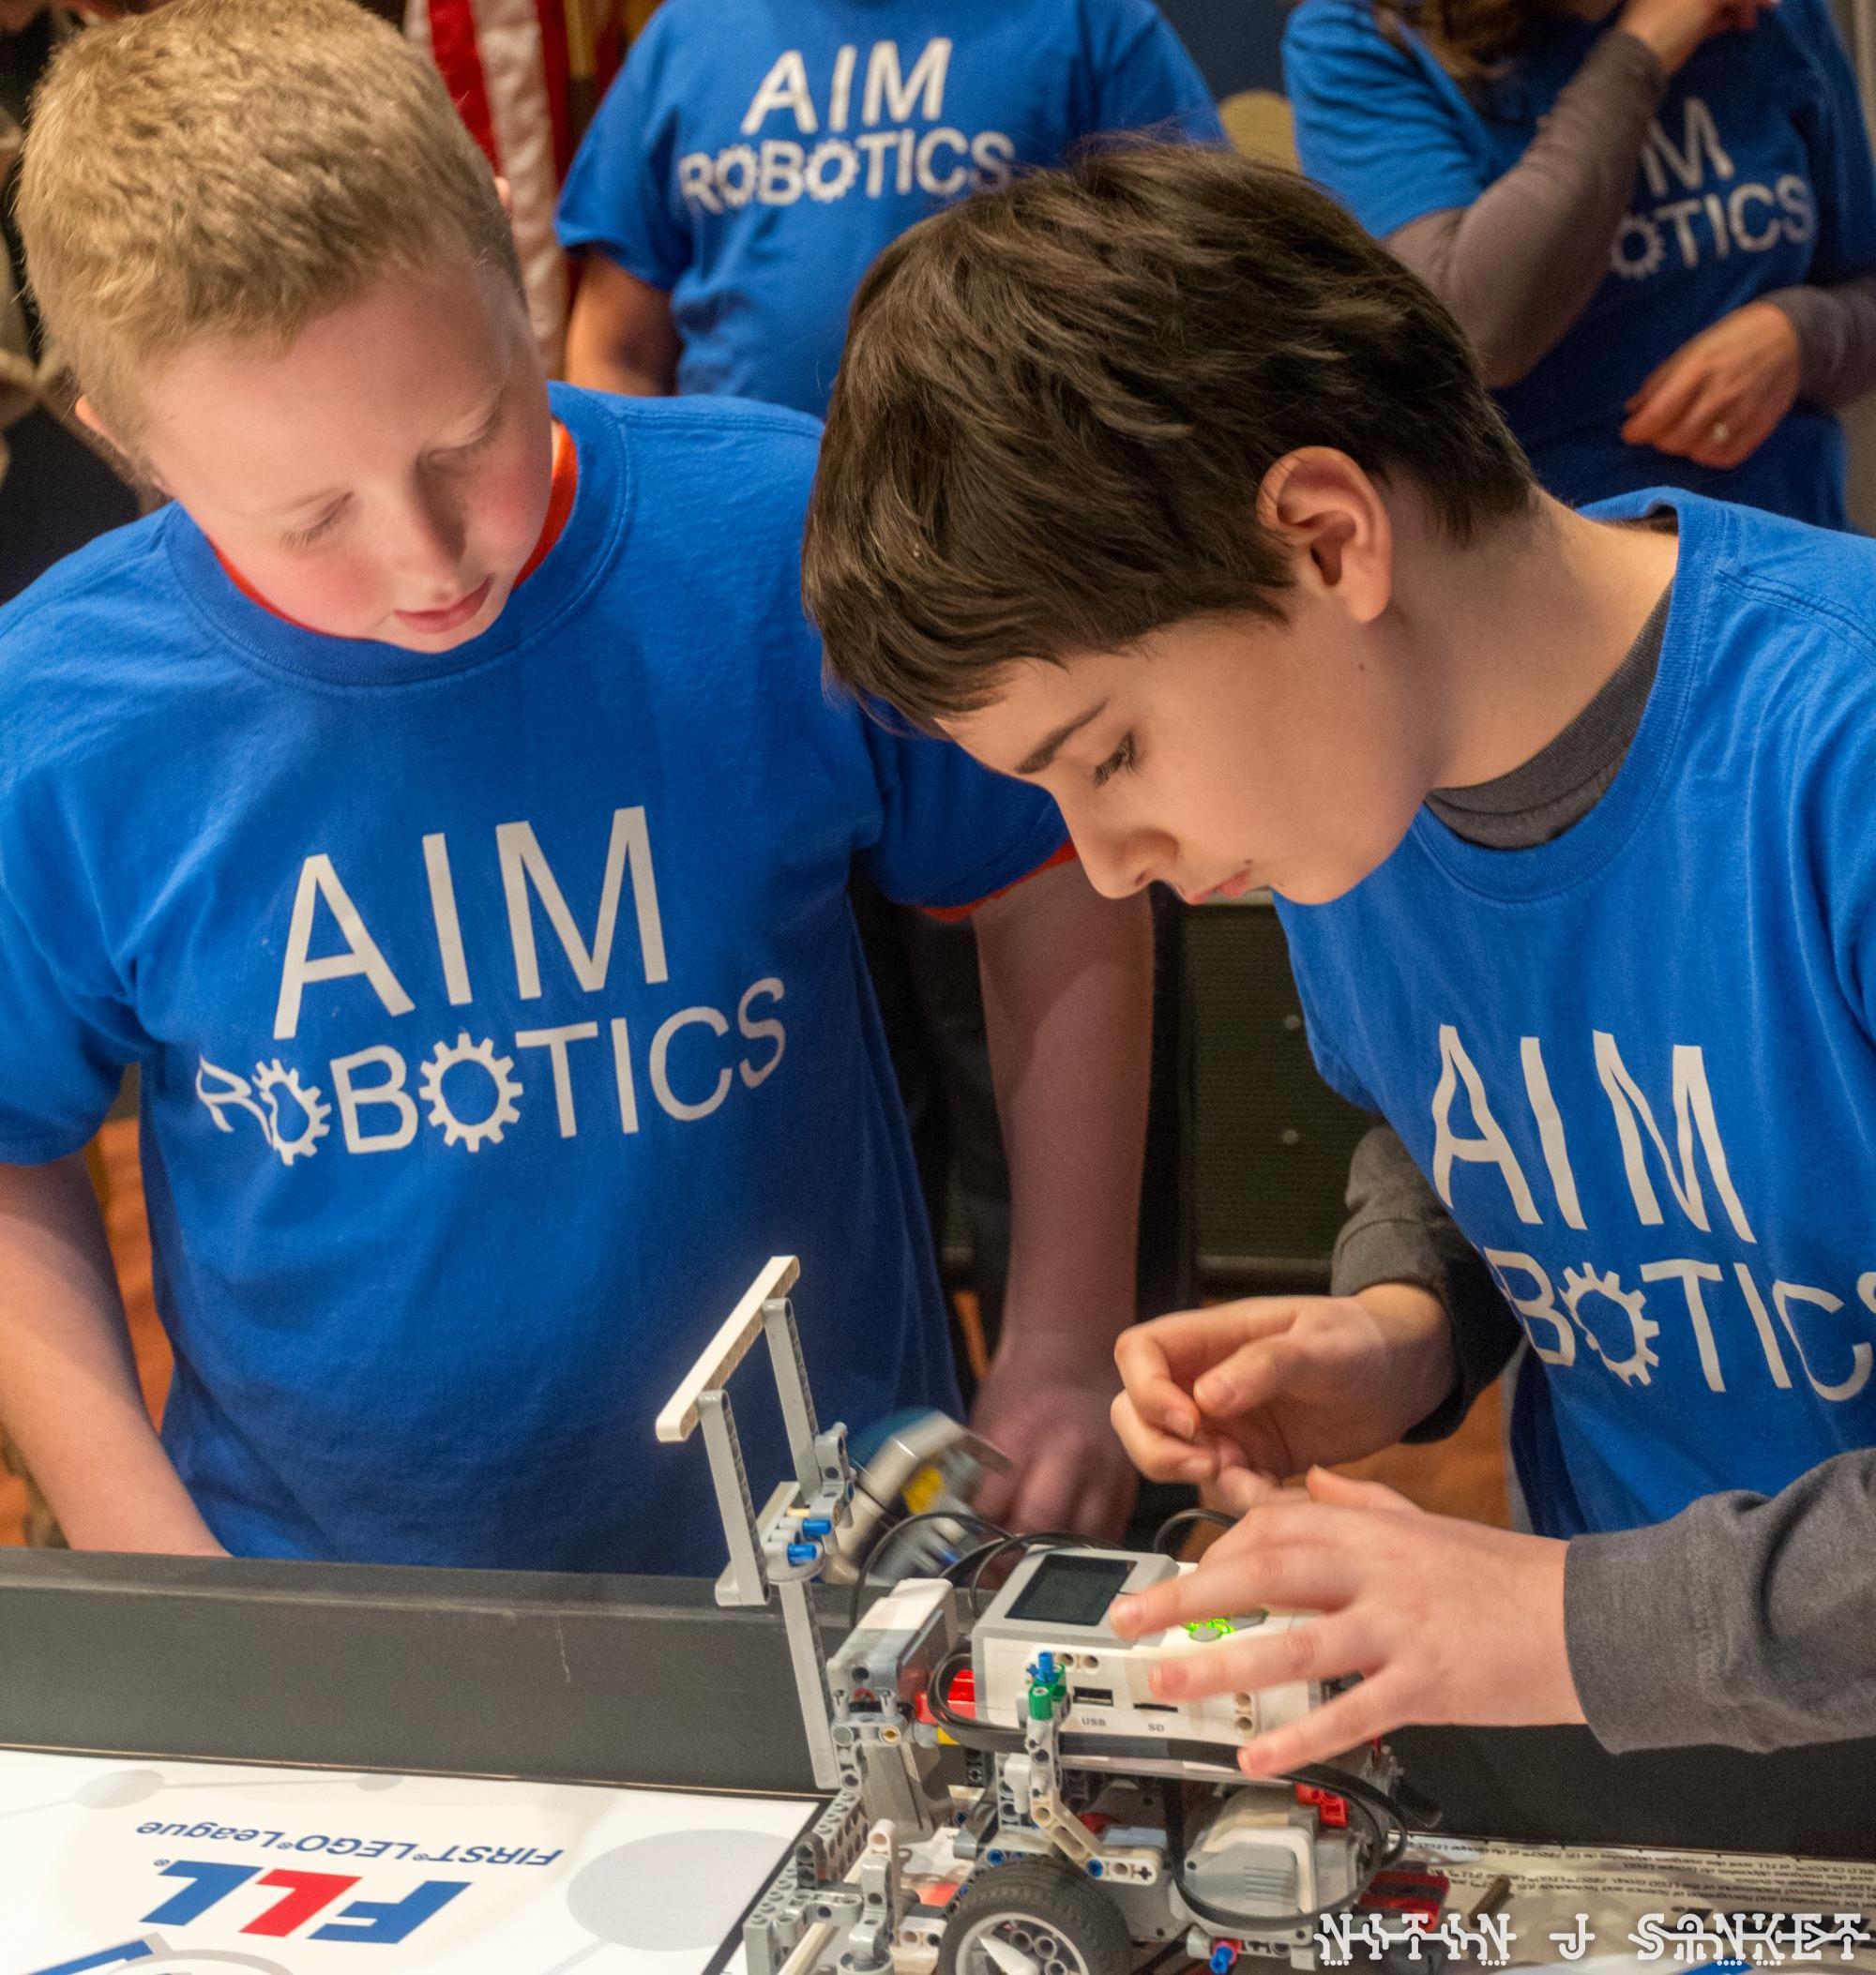 Robotics and Engineering - Academy in Manayunk